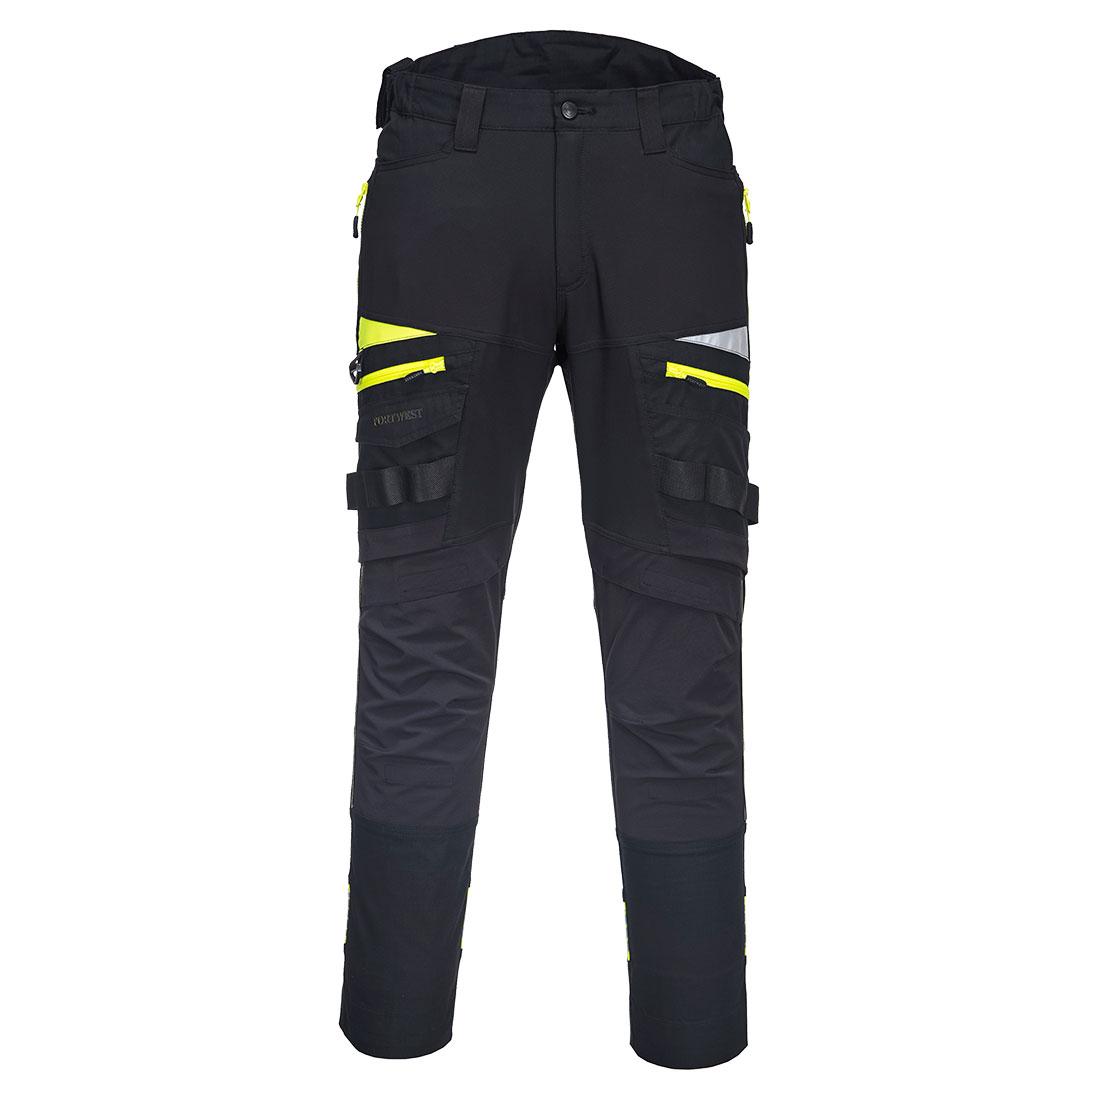 DX4 Work Trouser Black 38R